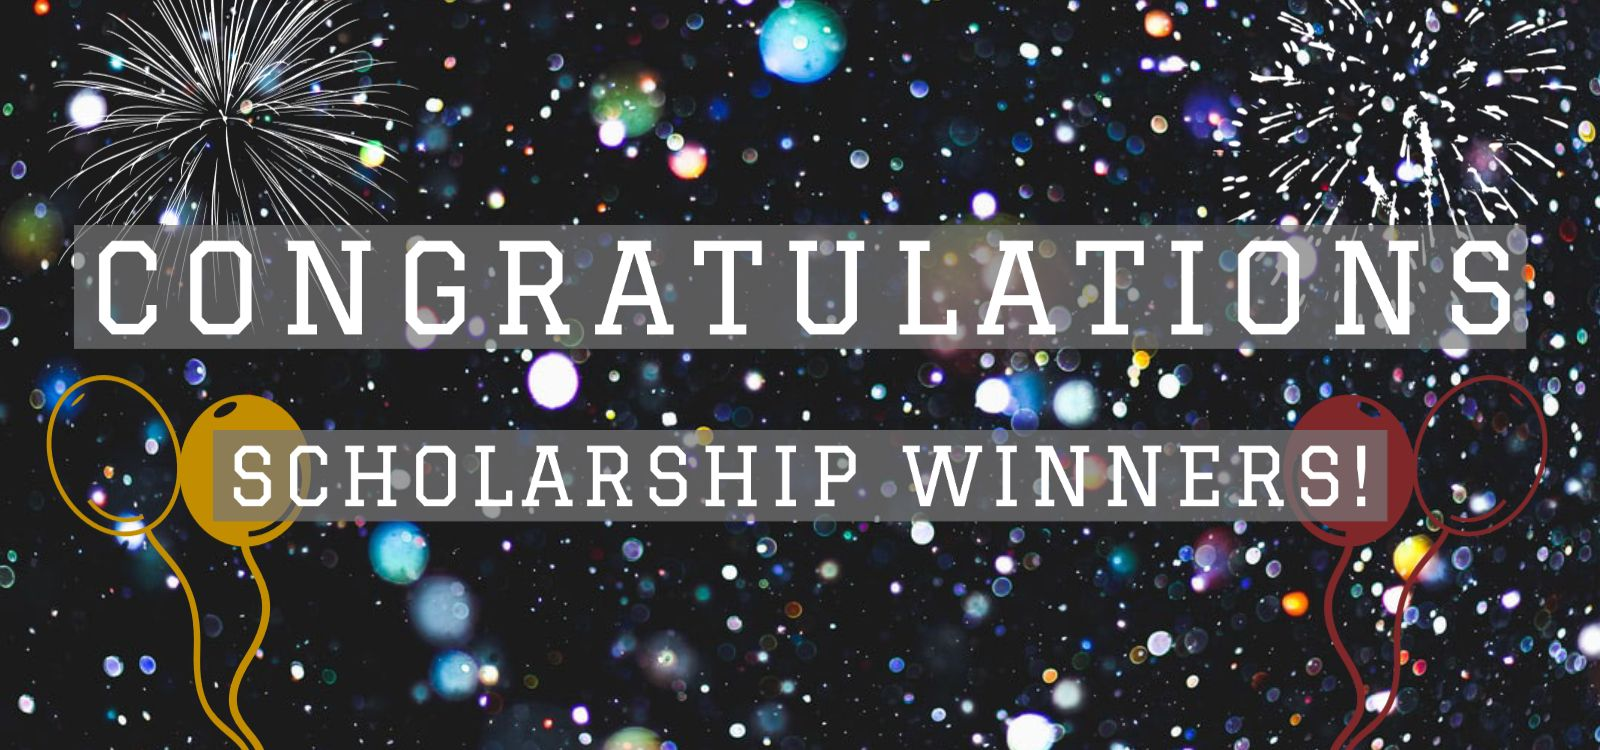 Congratulations All Scholarship Winners